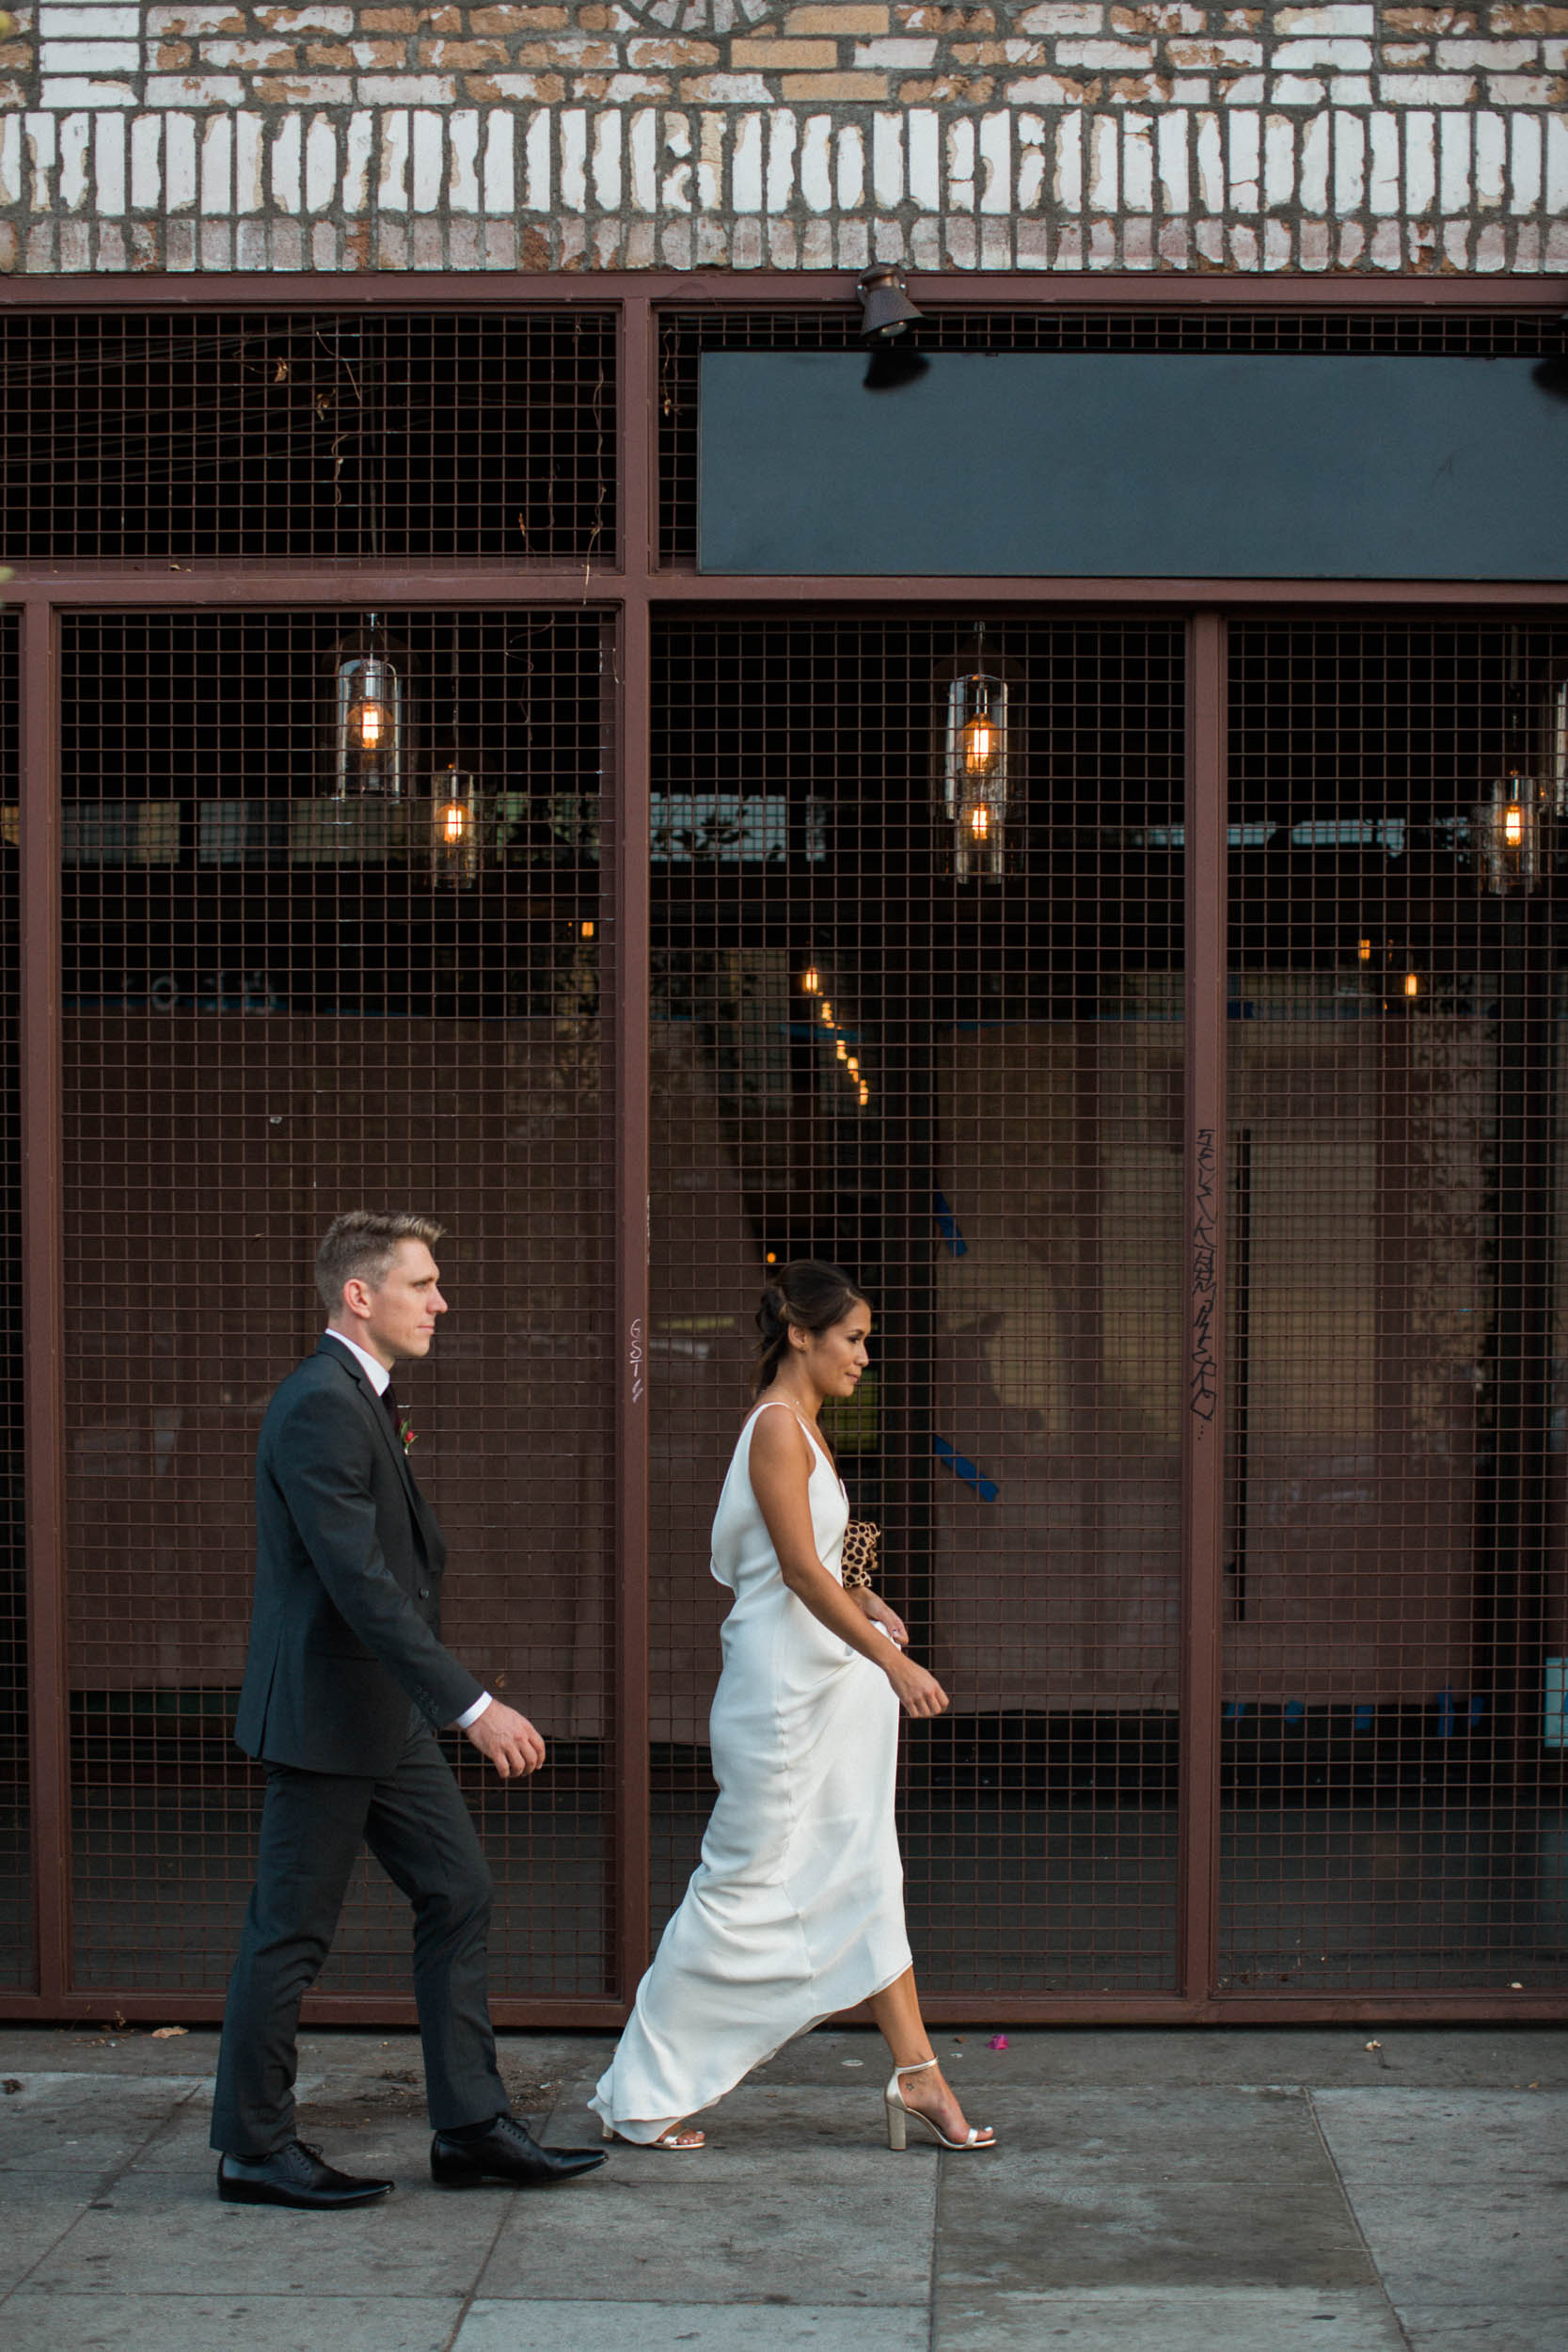 BKM-Photography-Highland-Park-Los-Angeles-Backyard-Wedding-0051.jpg